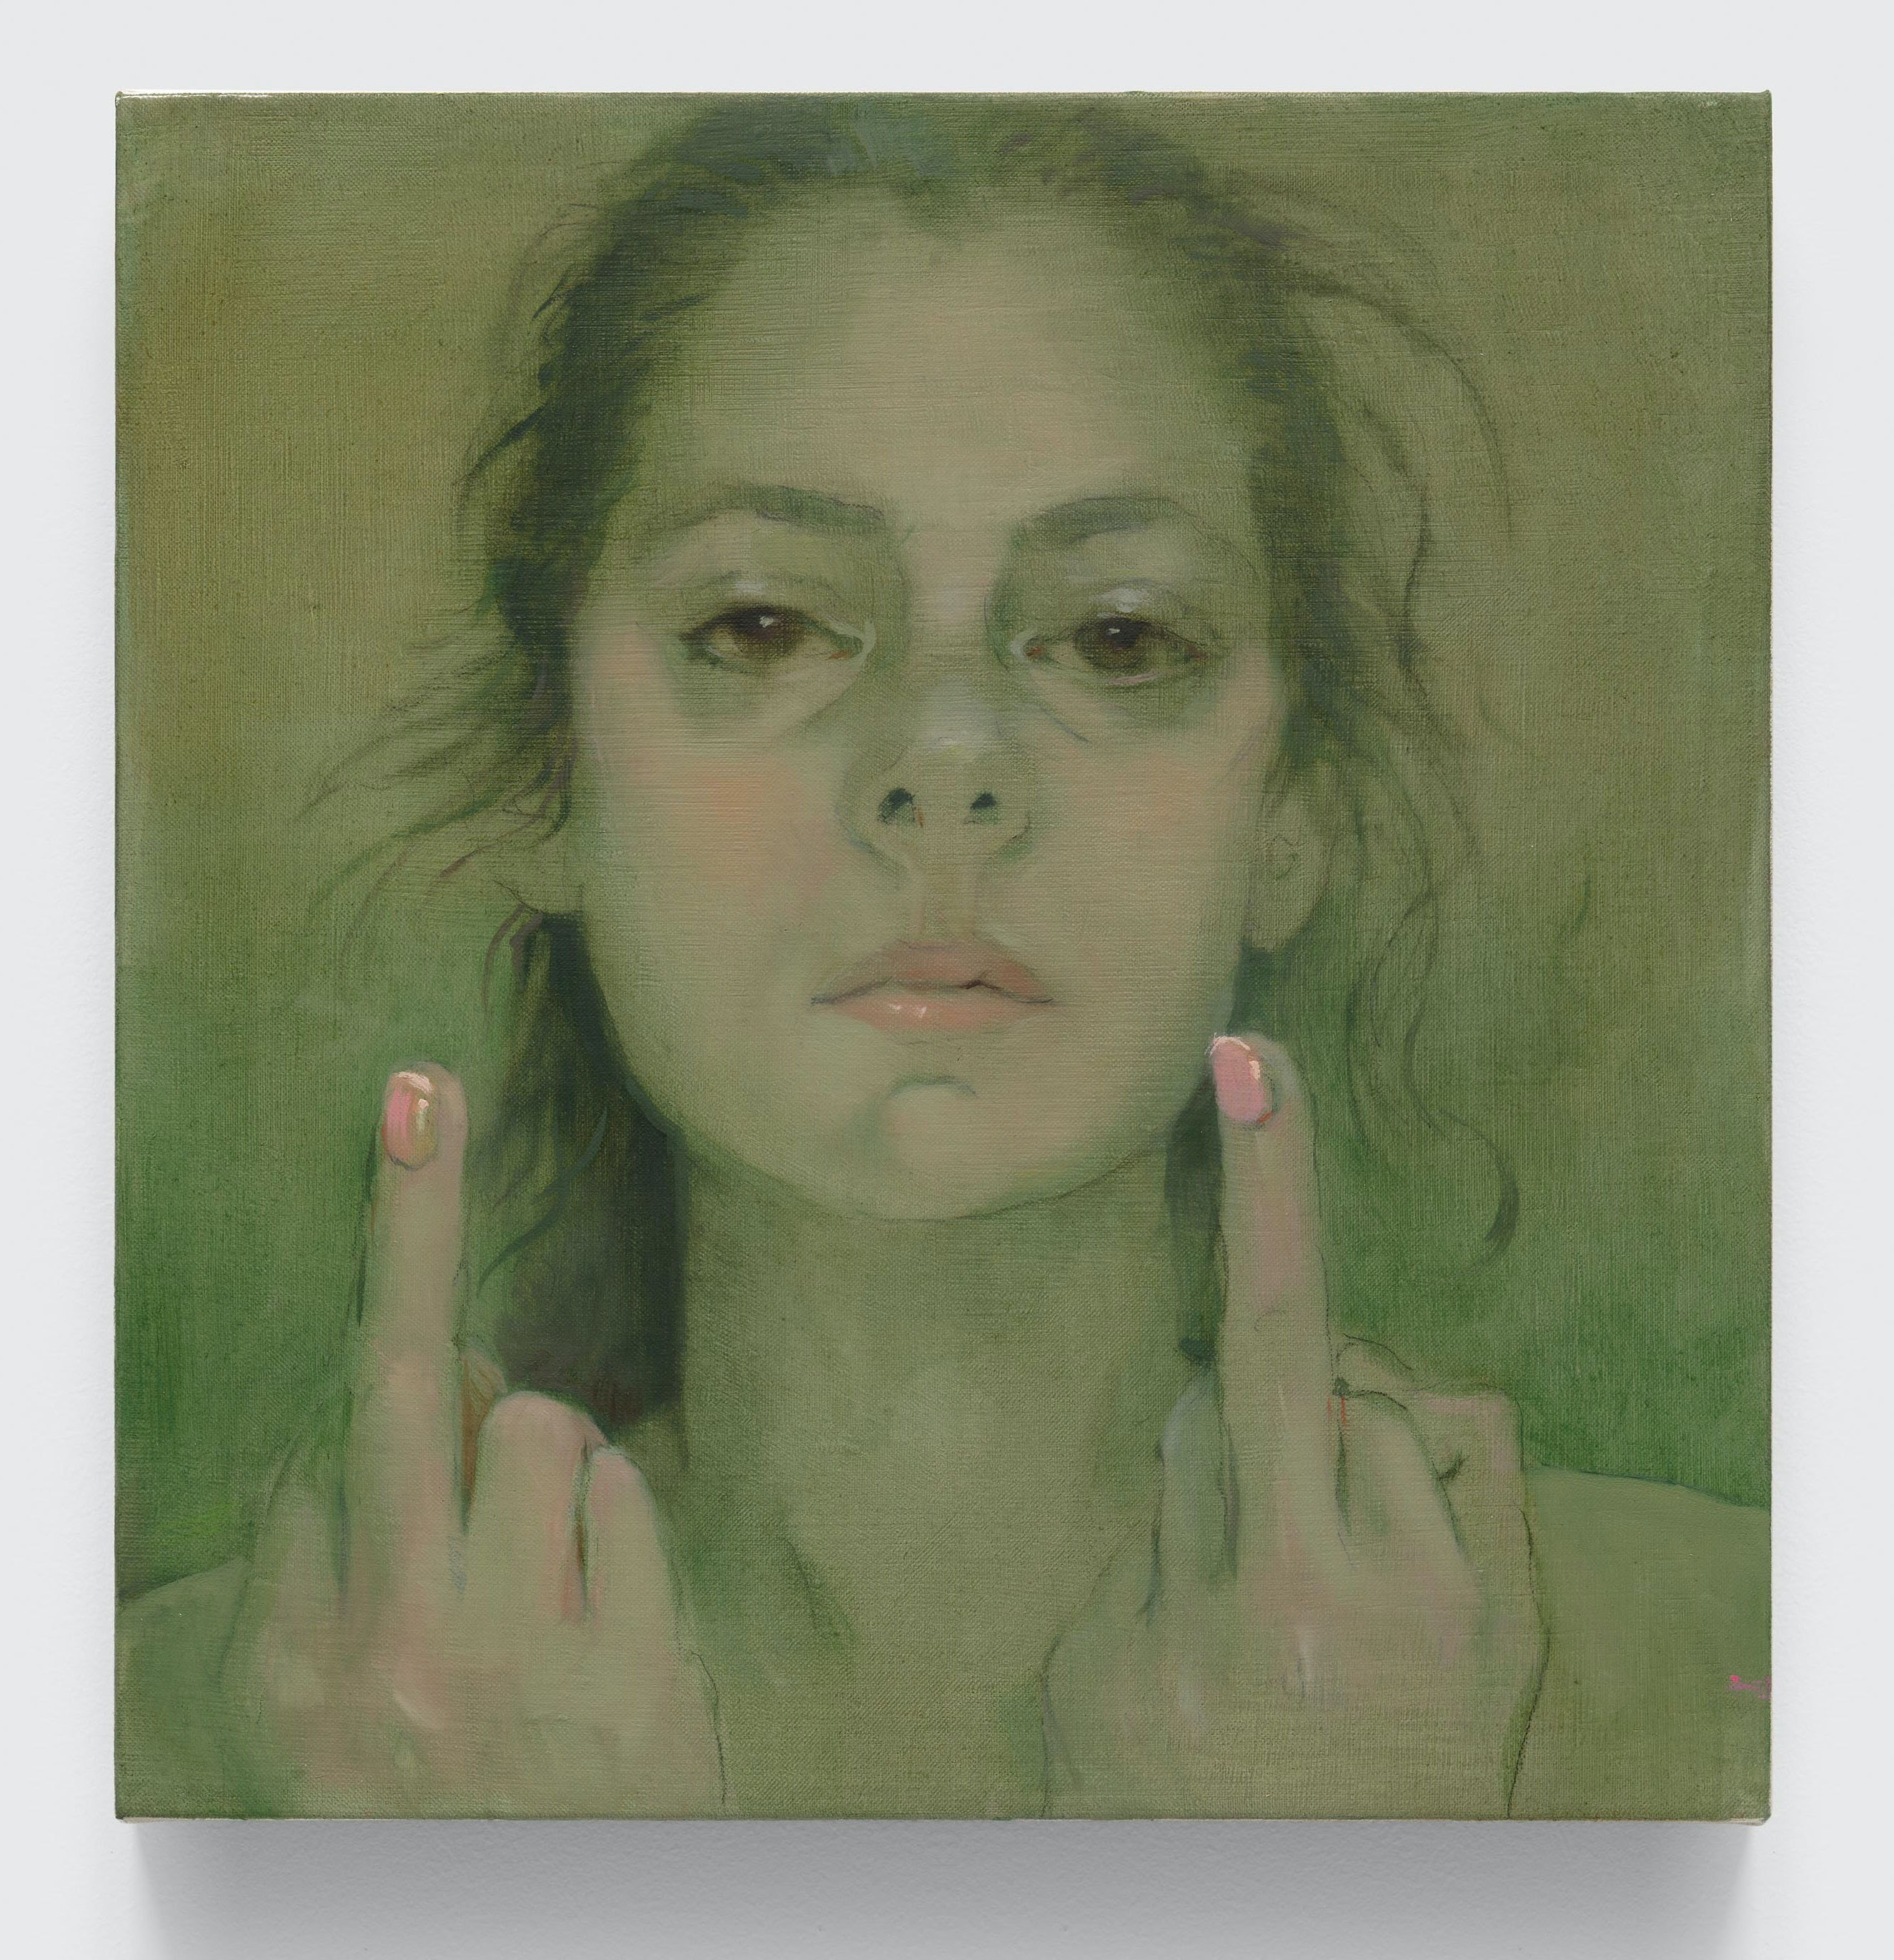 Lisa Yuskavage, <em>The Fuck You Painting</em>, 2020. © Lisa Yuskavage. Courtesy the artist and David Zwirner.